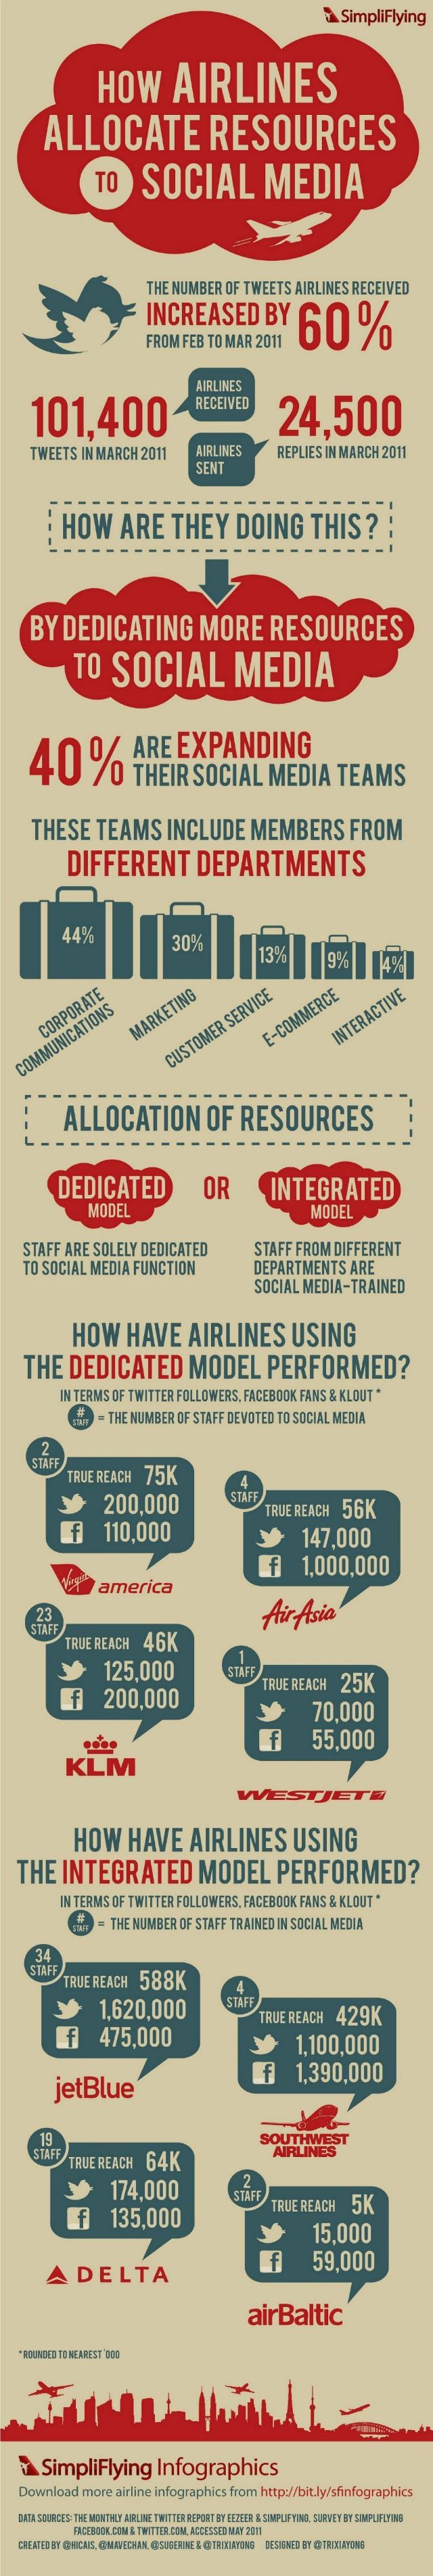 How airlines allocate resources to social media.: Media Infographics, Marketing, Social Media, Allocate Resources, Airlines Social, Socialmedia, Airlines Allocate, Medium, Design